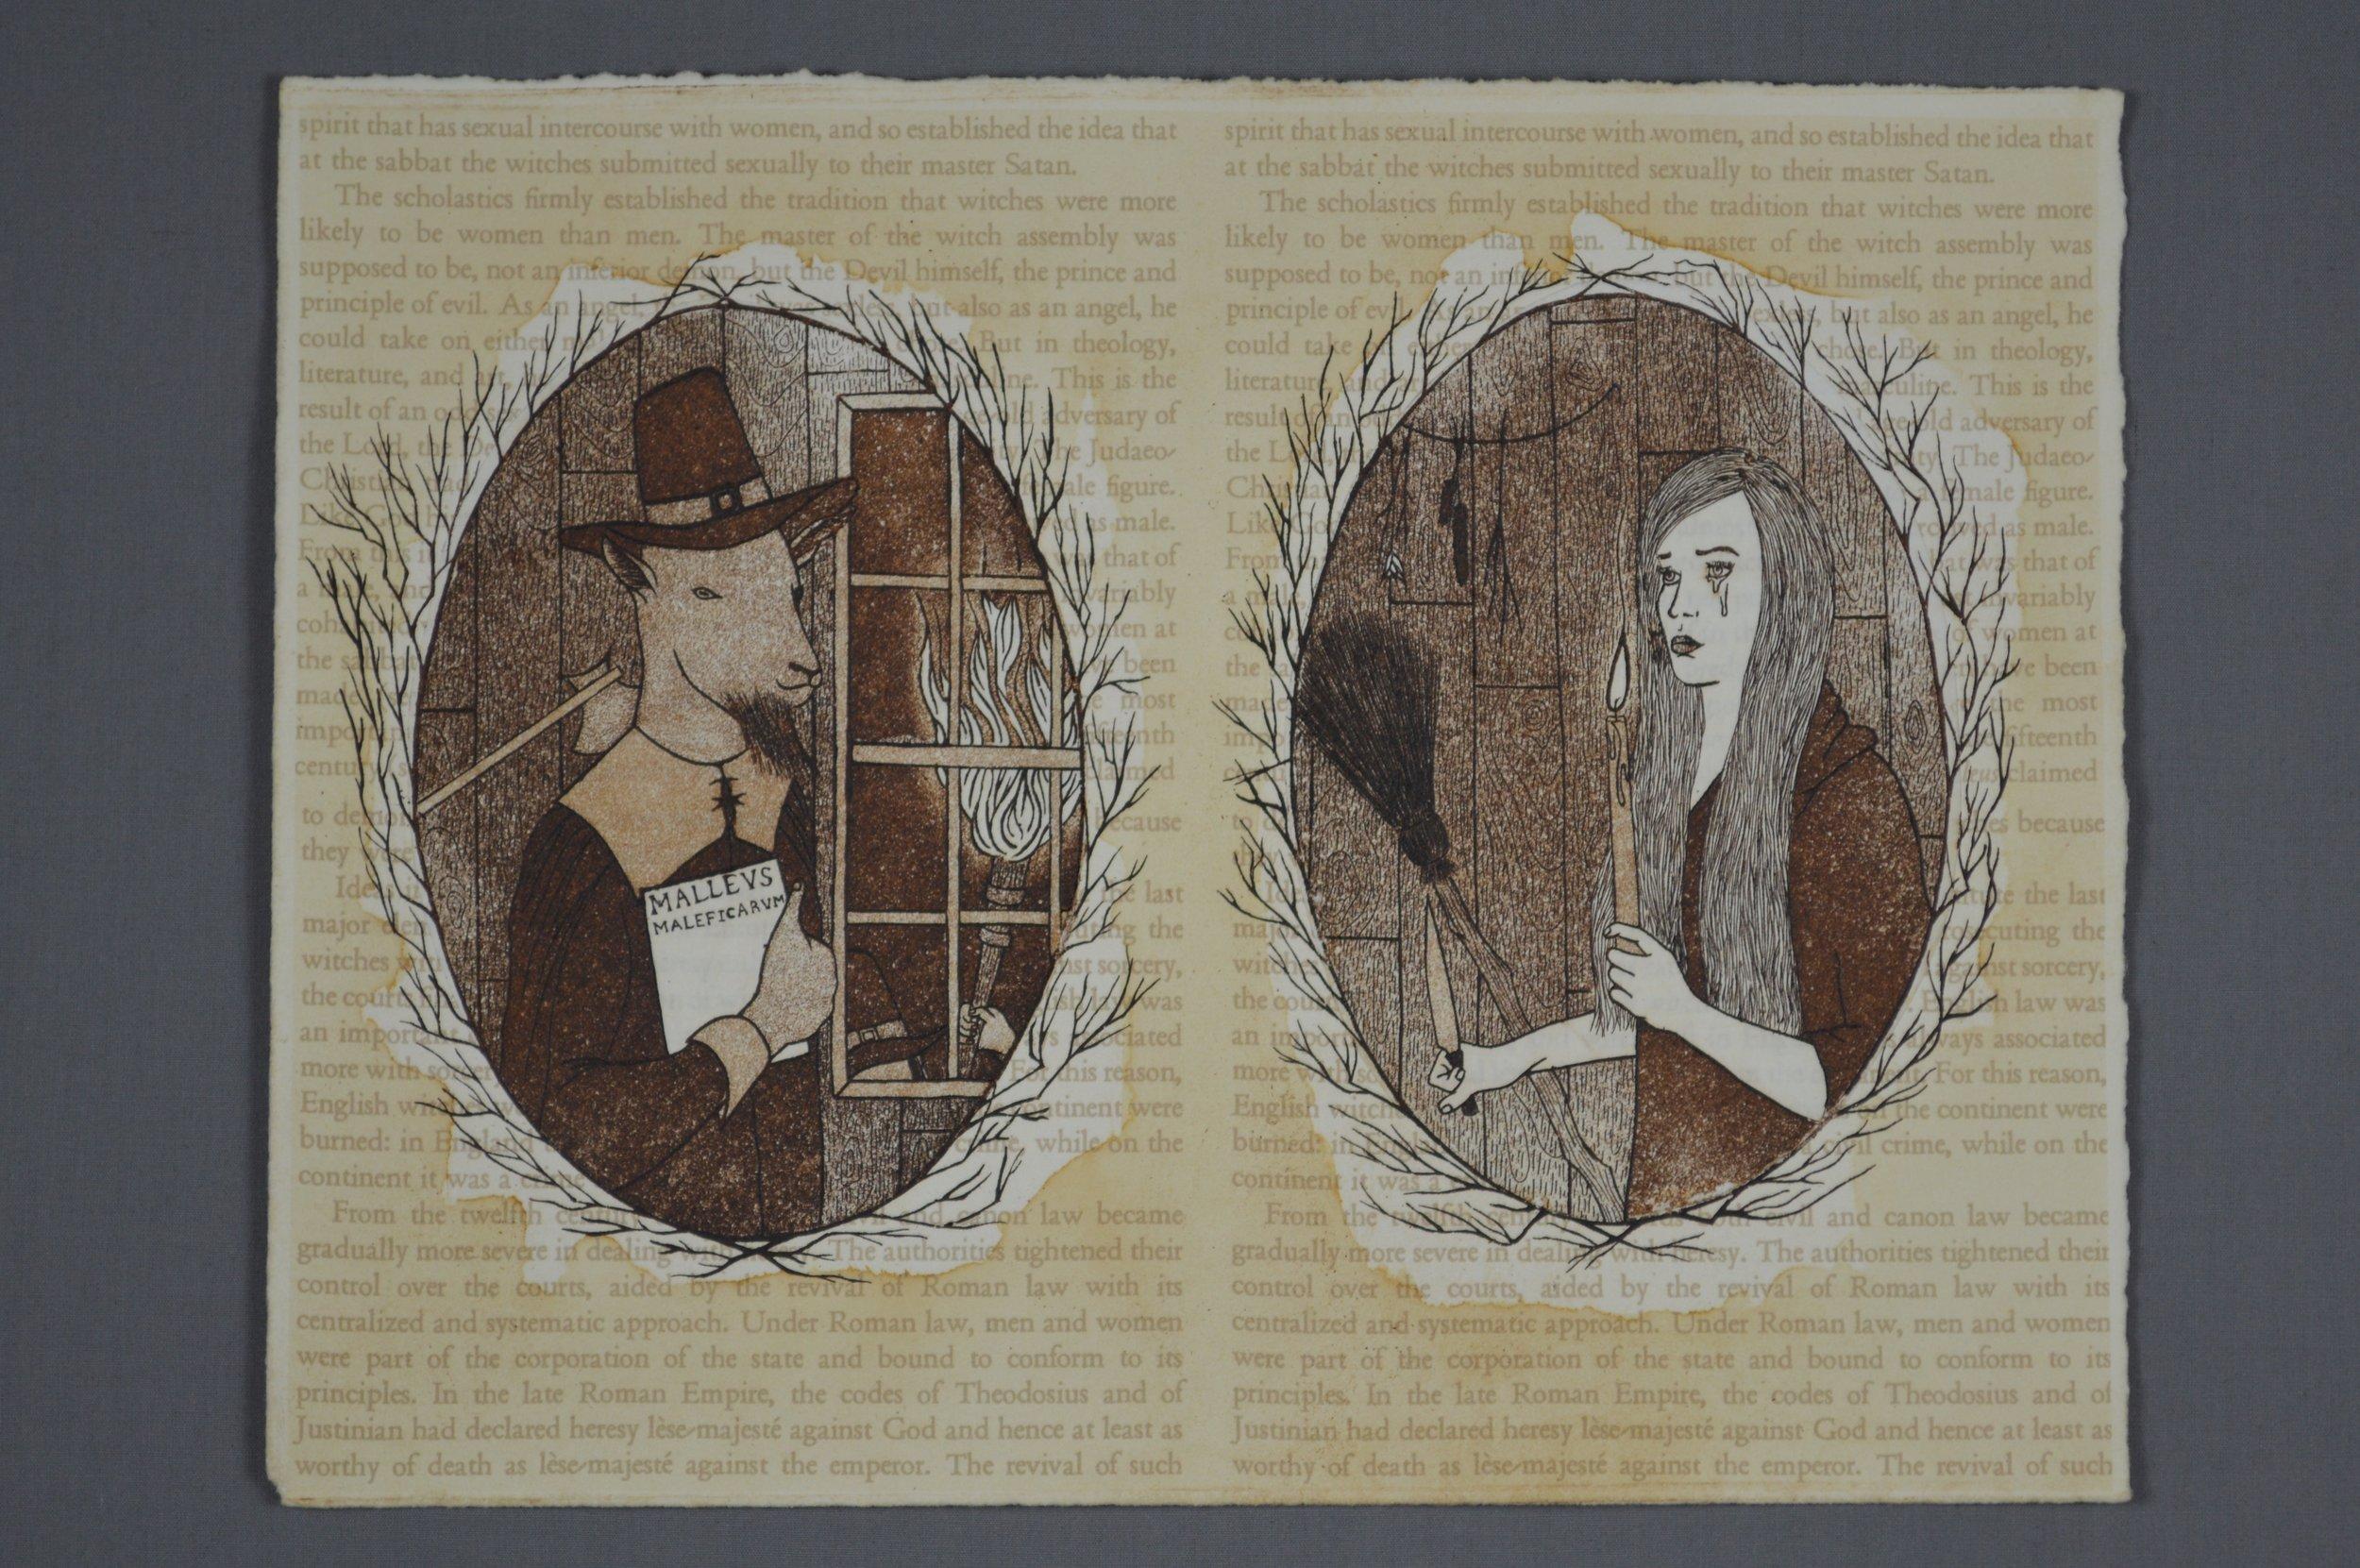 Malleus MaleficarumChinecoelle - Maeve McGrath